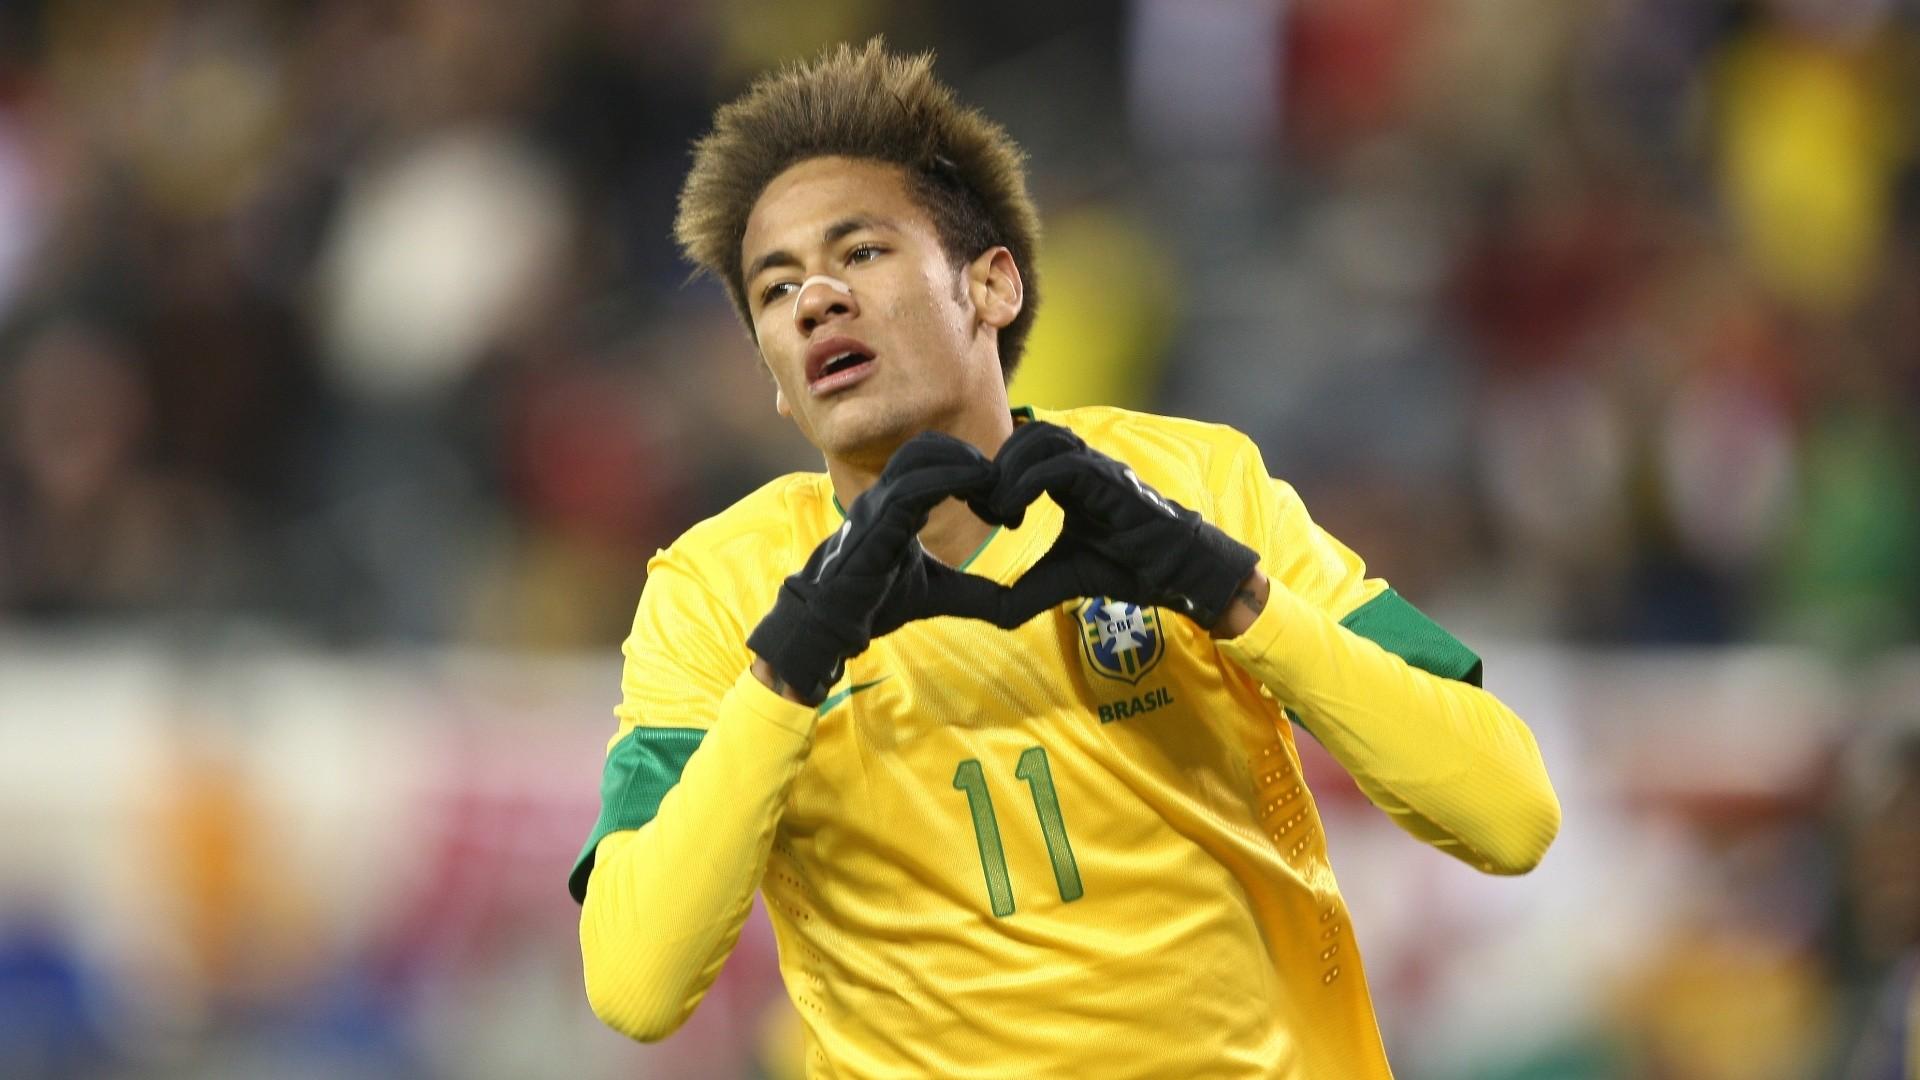 Hd Images Of Neymar: Neymar Jr Wallpaper 2018 HD (76+ Images